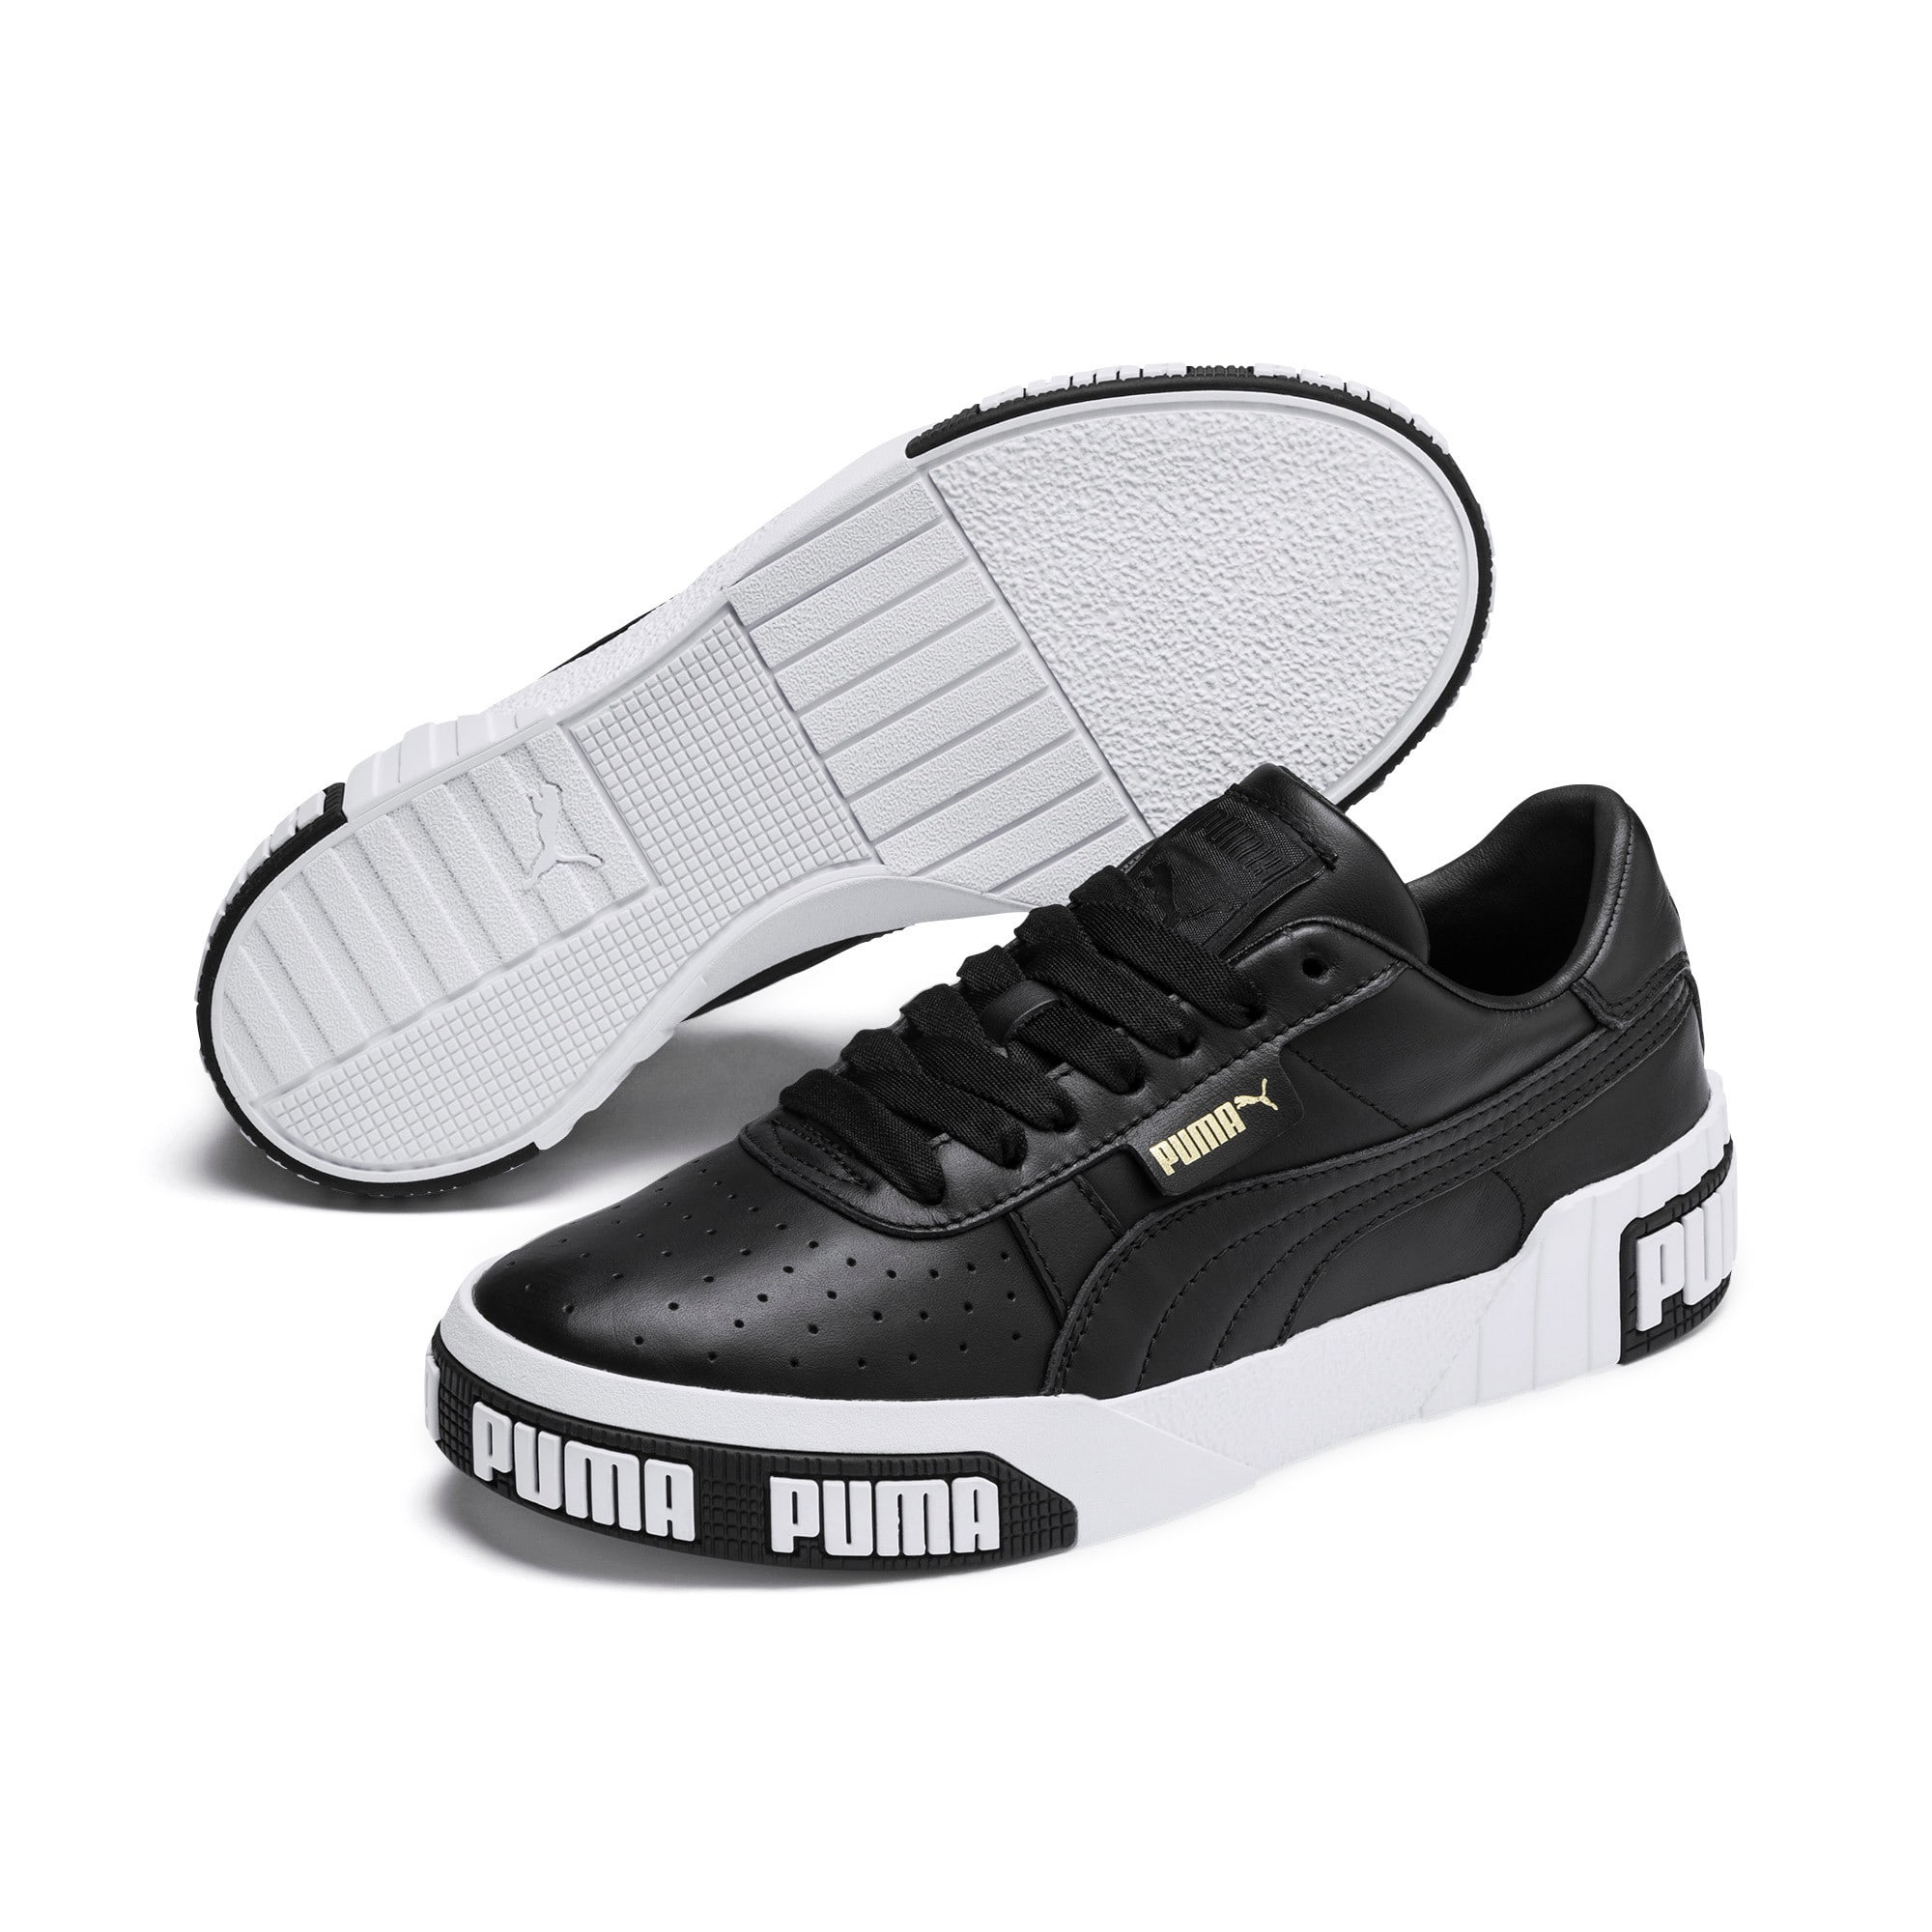 Thumbnail 3 of Cali Bold Women's Sneakers, Puma Black-Metallic Gold, medium